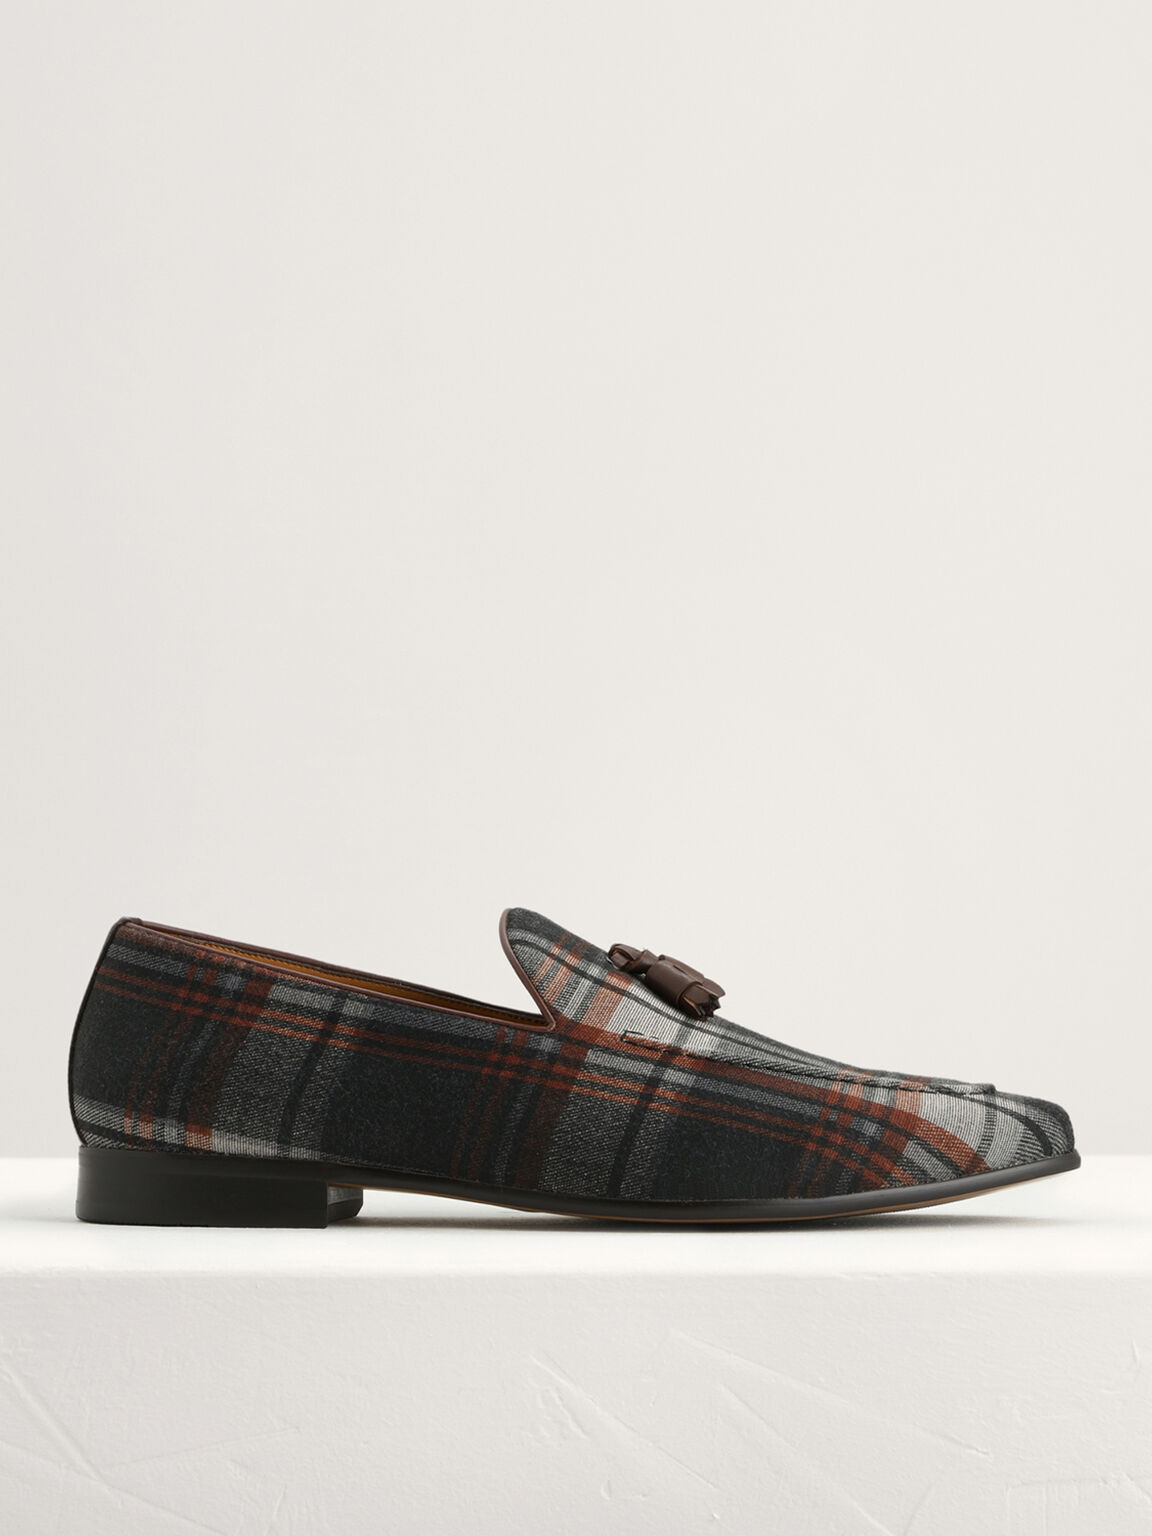 Leather Tasselled Loafers, Multi, hi-res